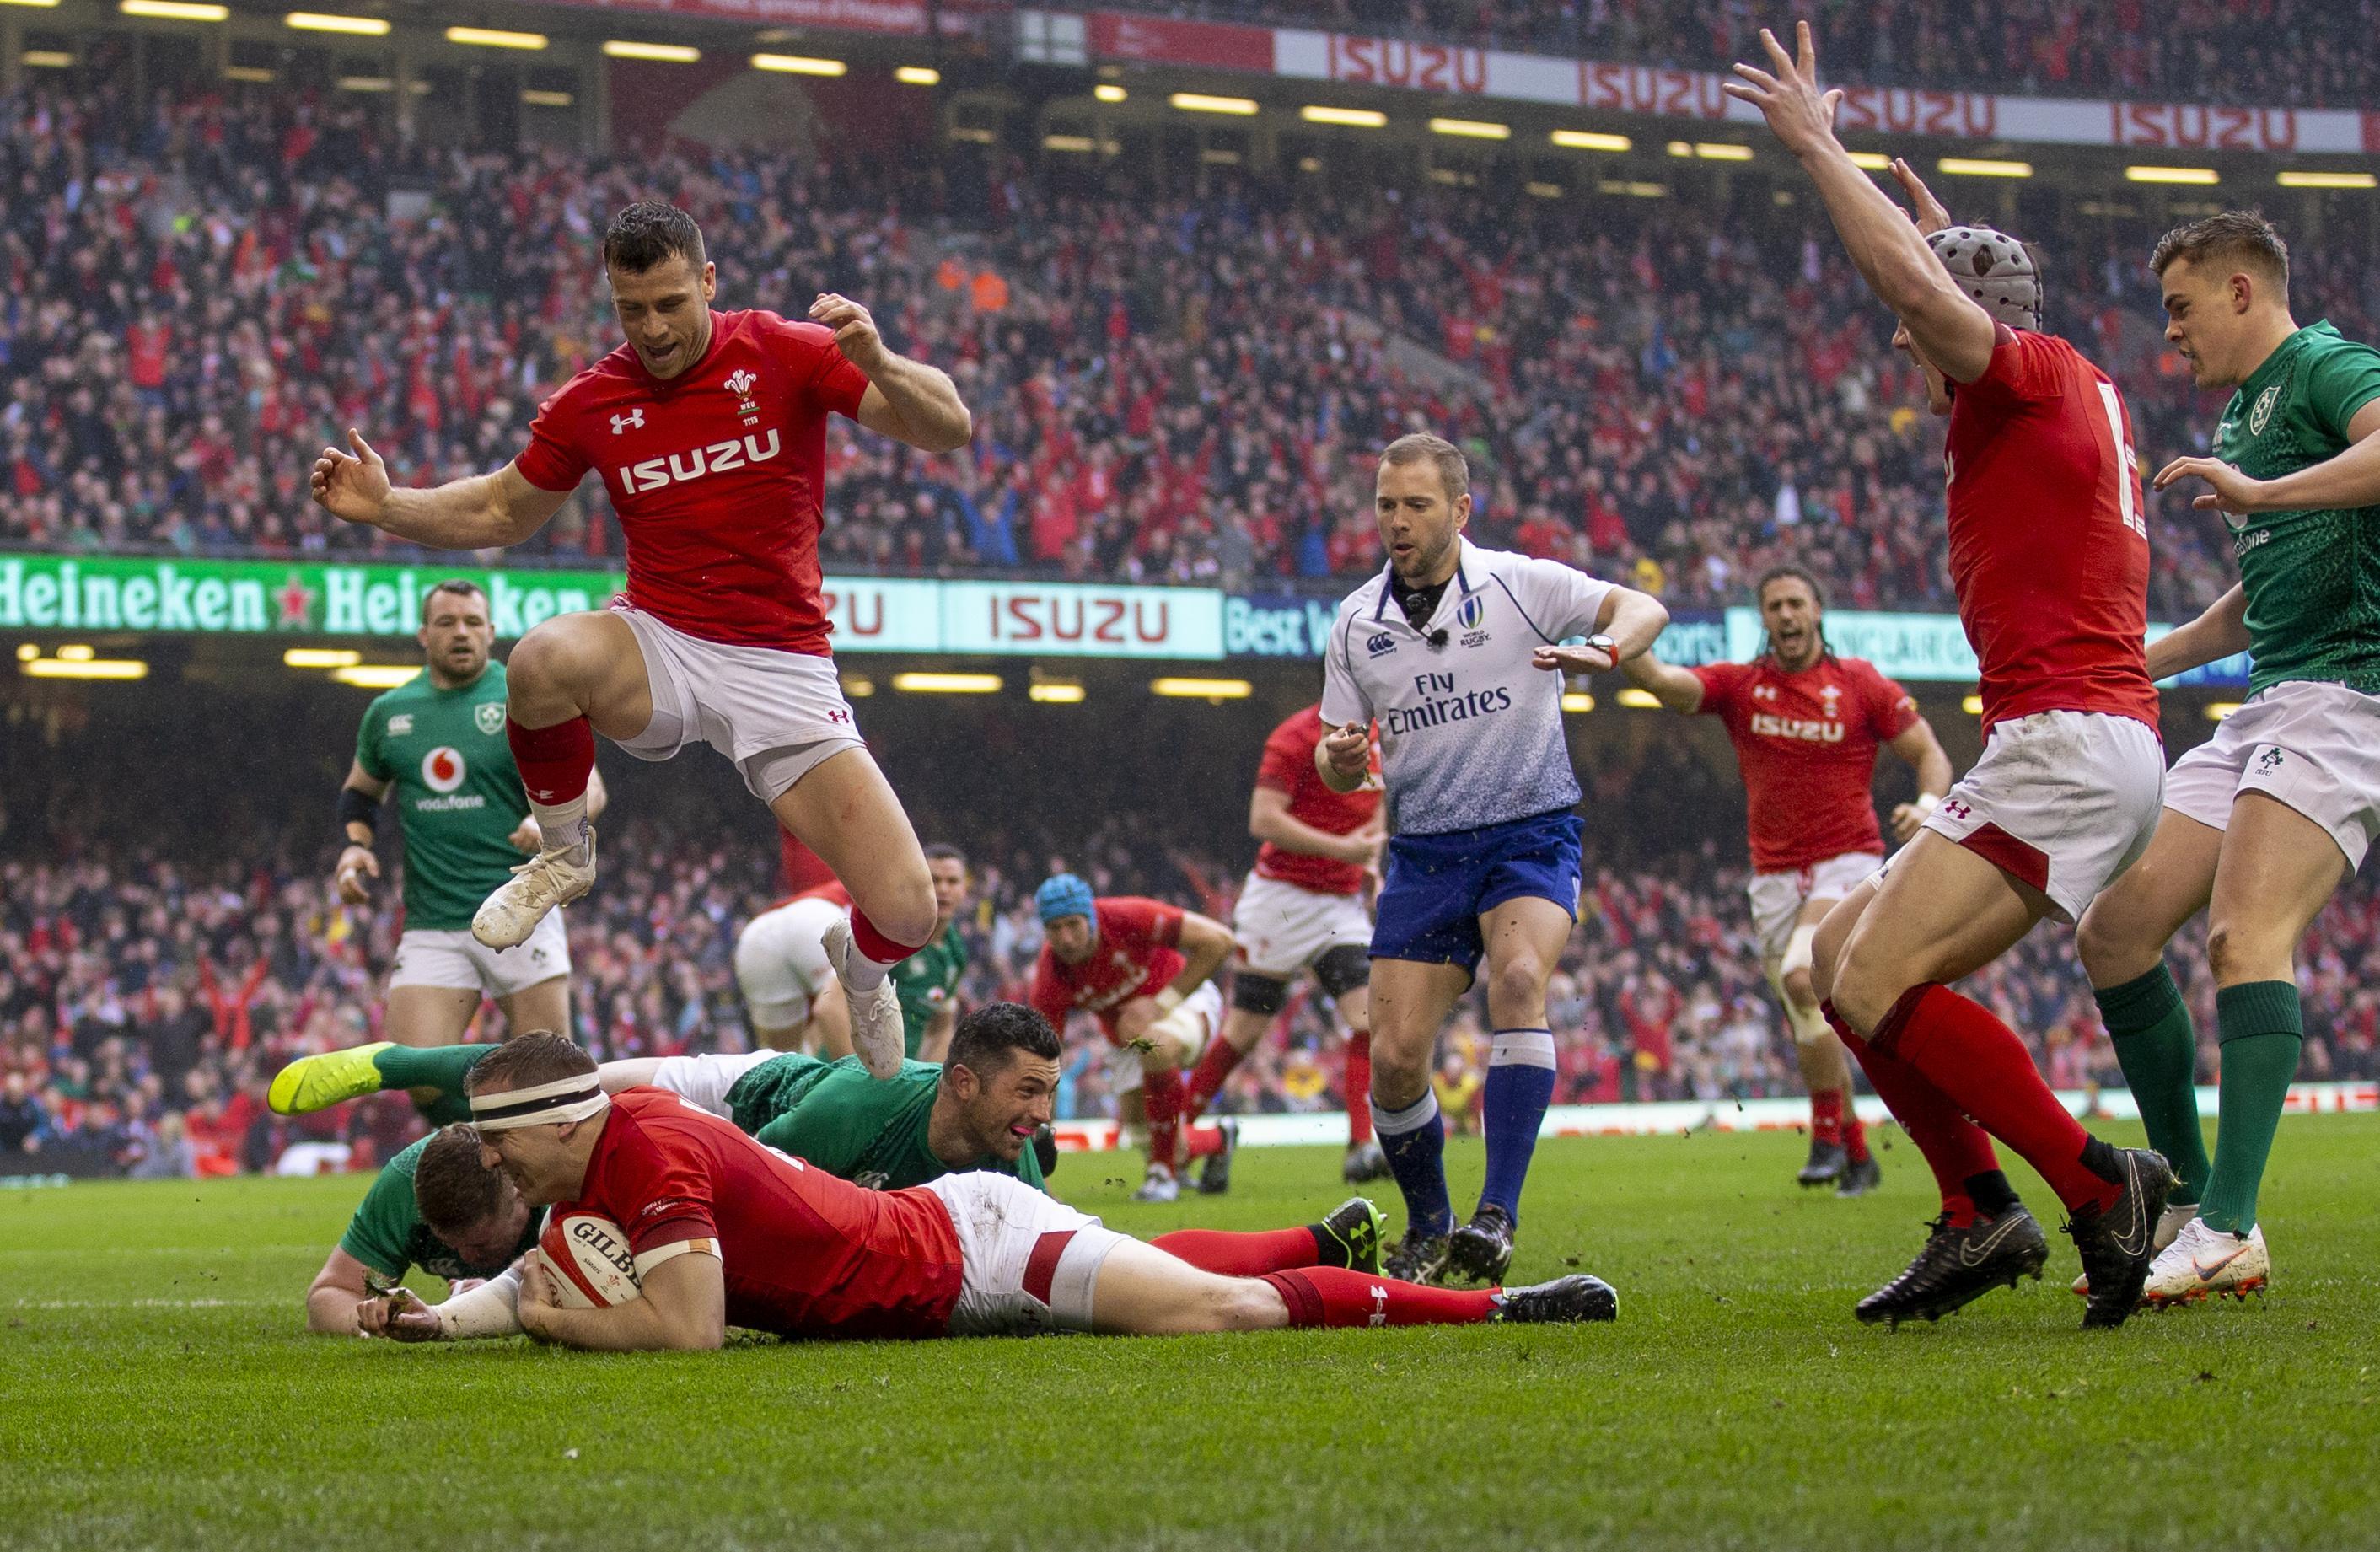 Wales crush Ireland to win third Six Nations grand slam in 11 years